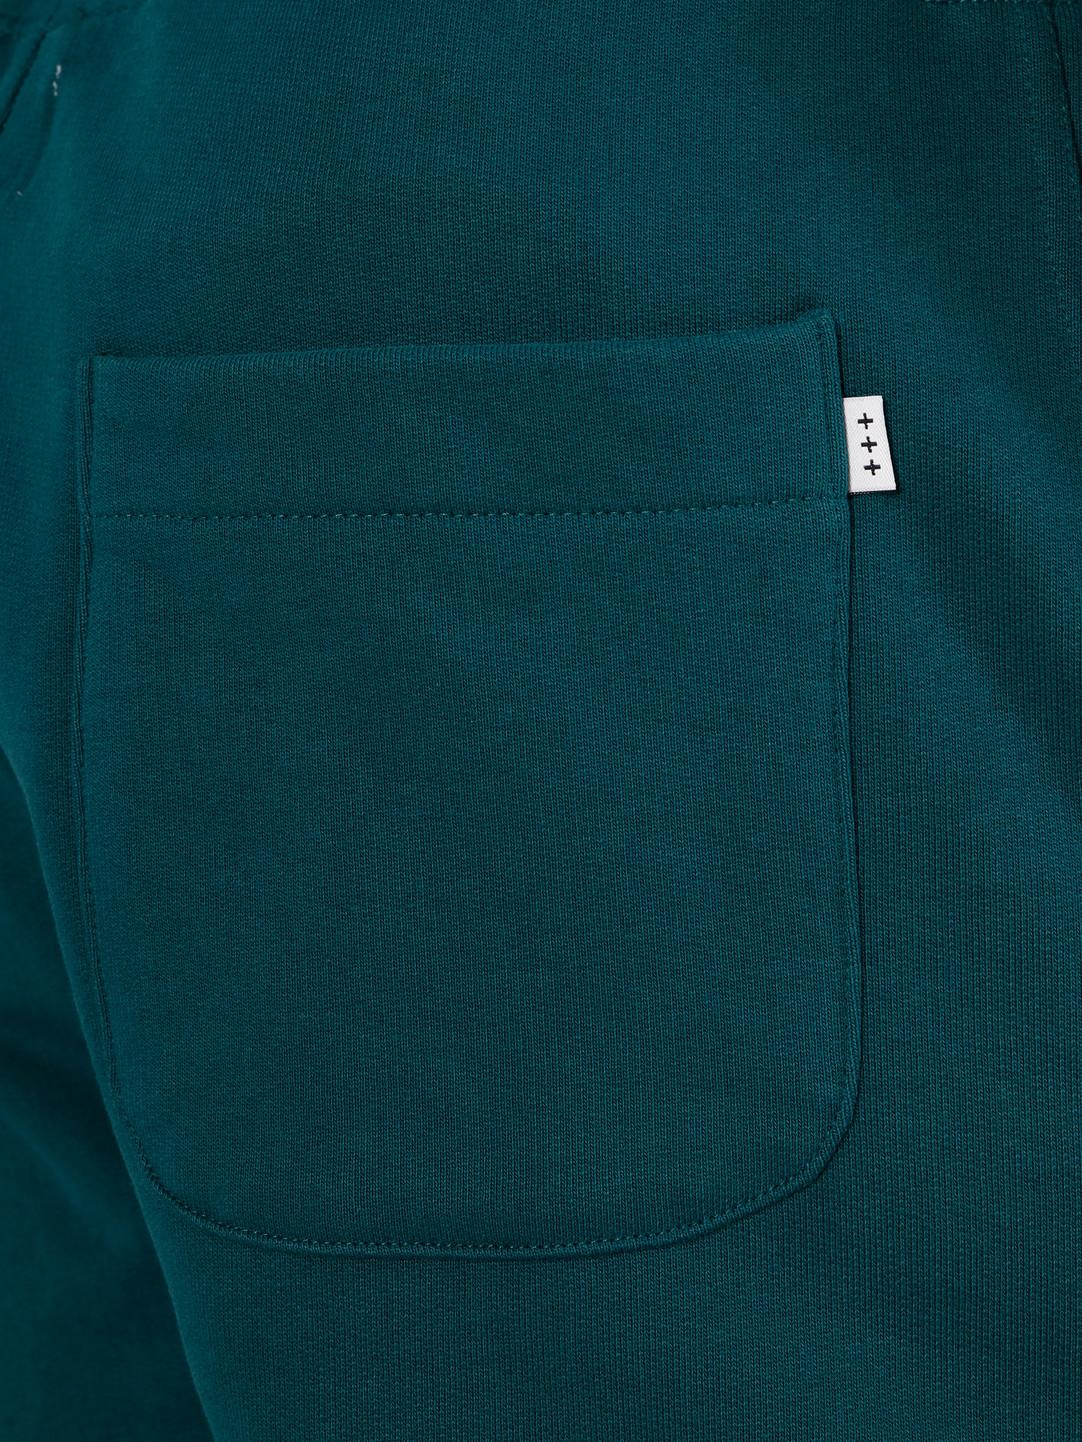 Quality Blanks Quality Blanks QB30 Sweat Short Dark Teal